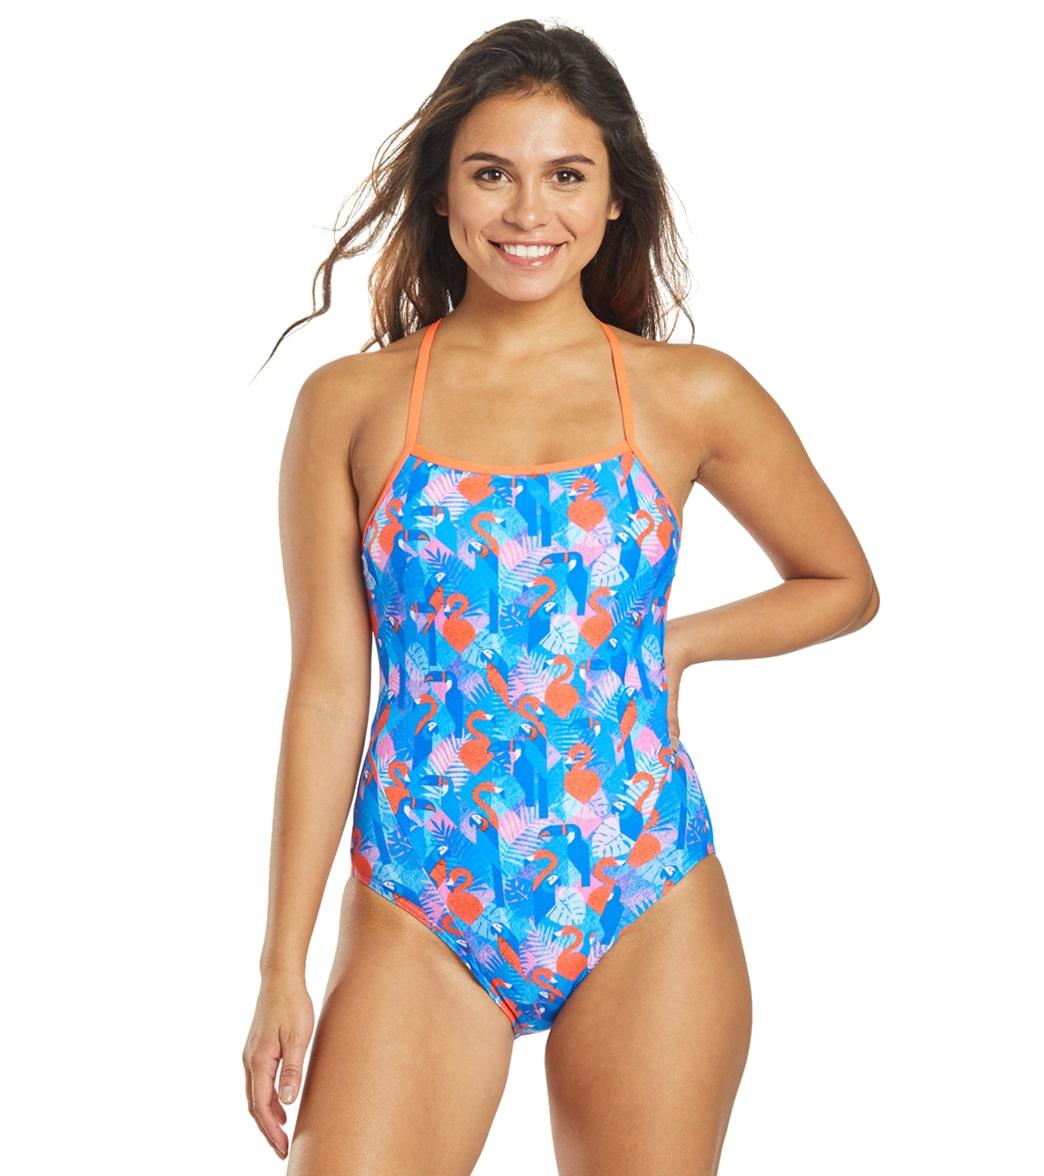 Funkita Women's Flaming Vegas Single Strap One Piece Swimsuit